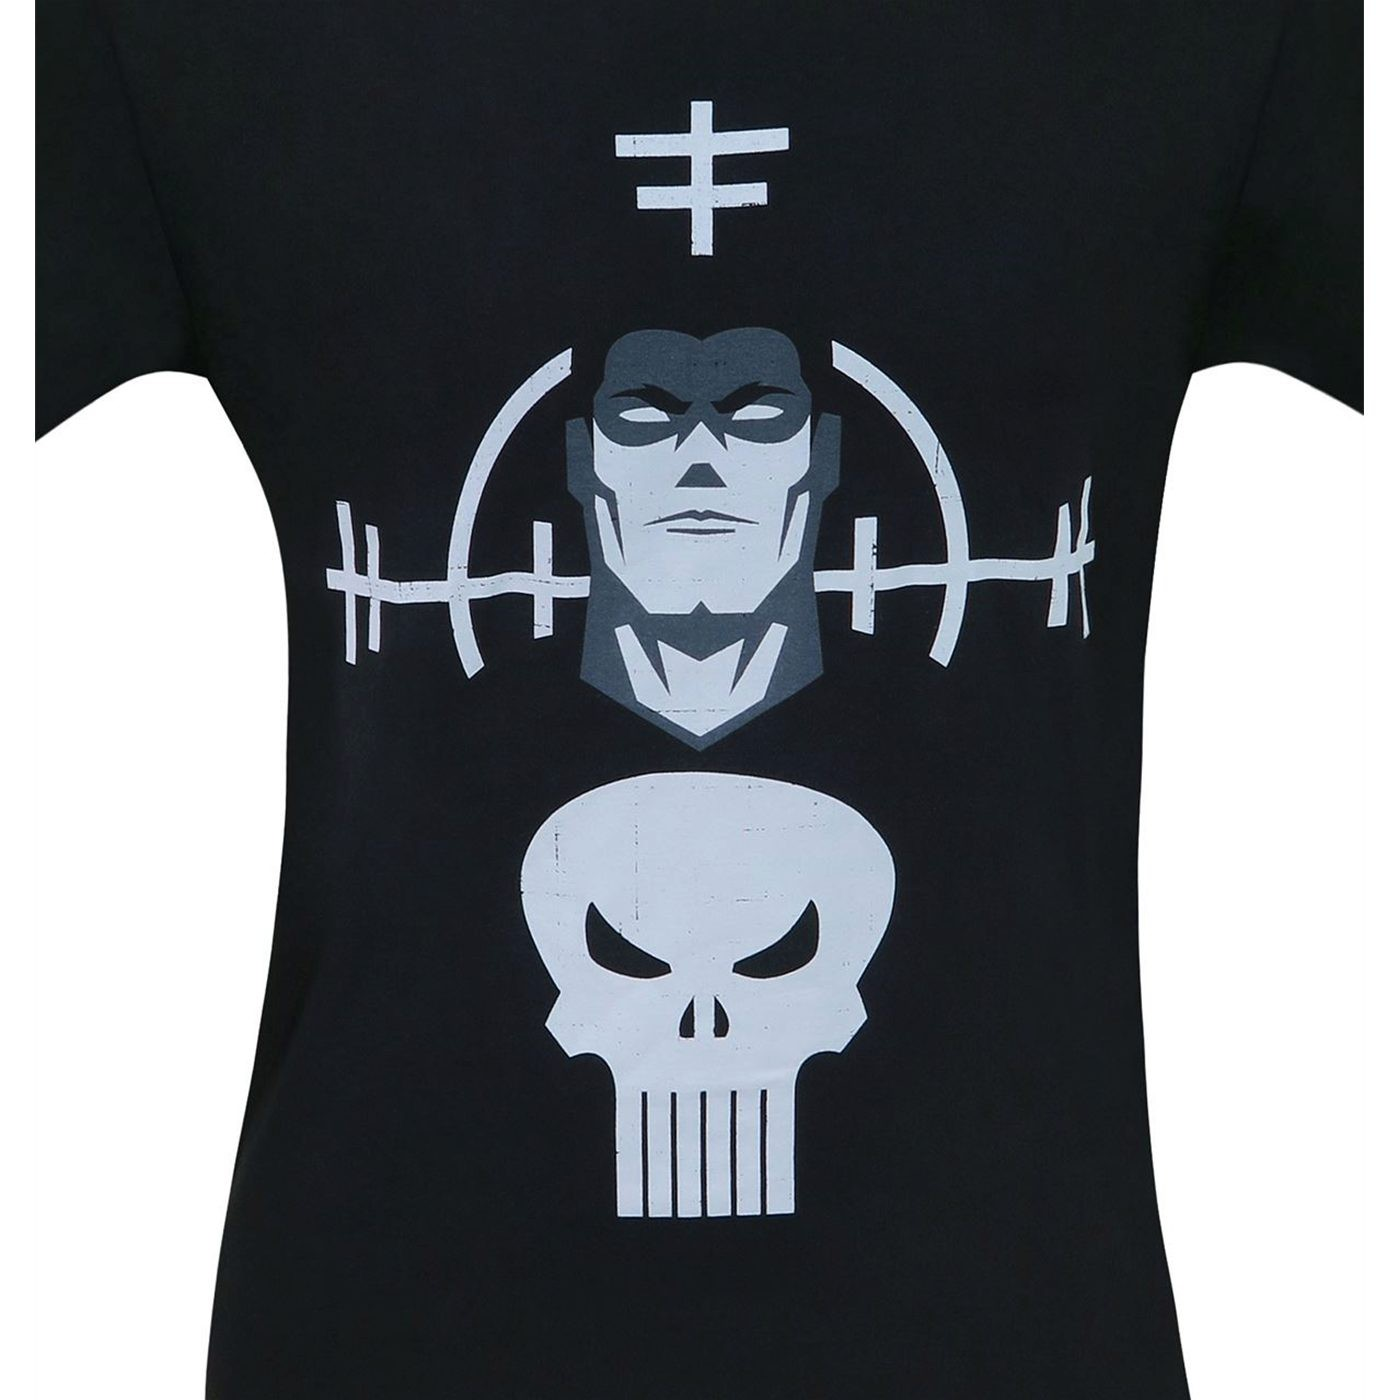 Punisher and Target Minimalist Men's T-Shirt